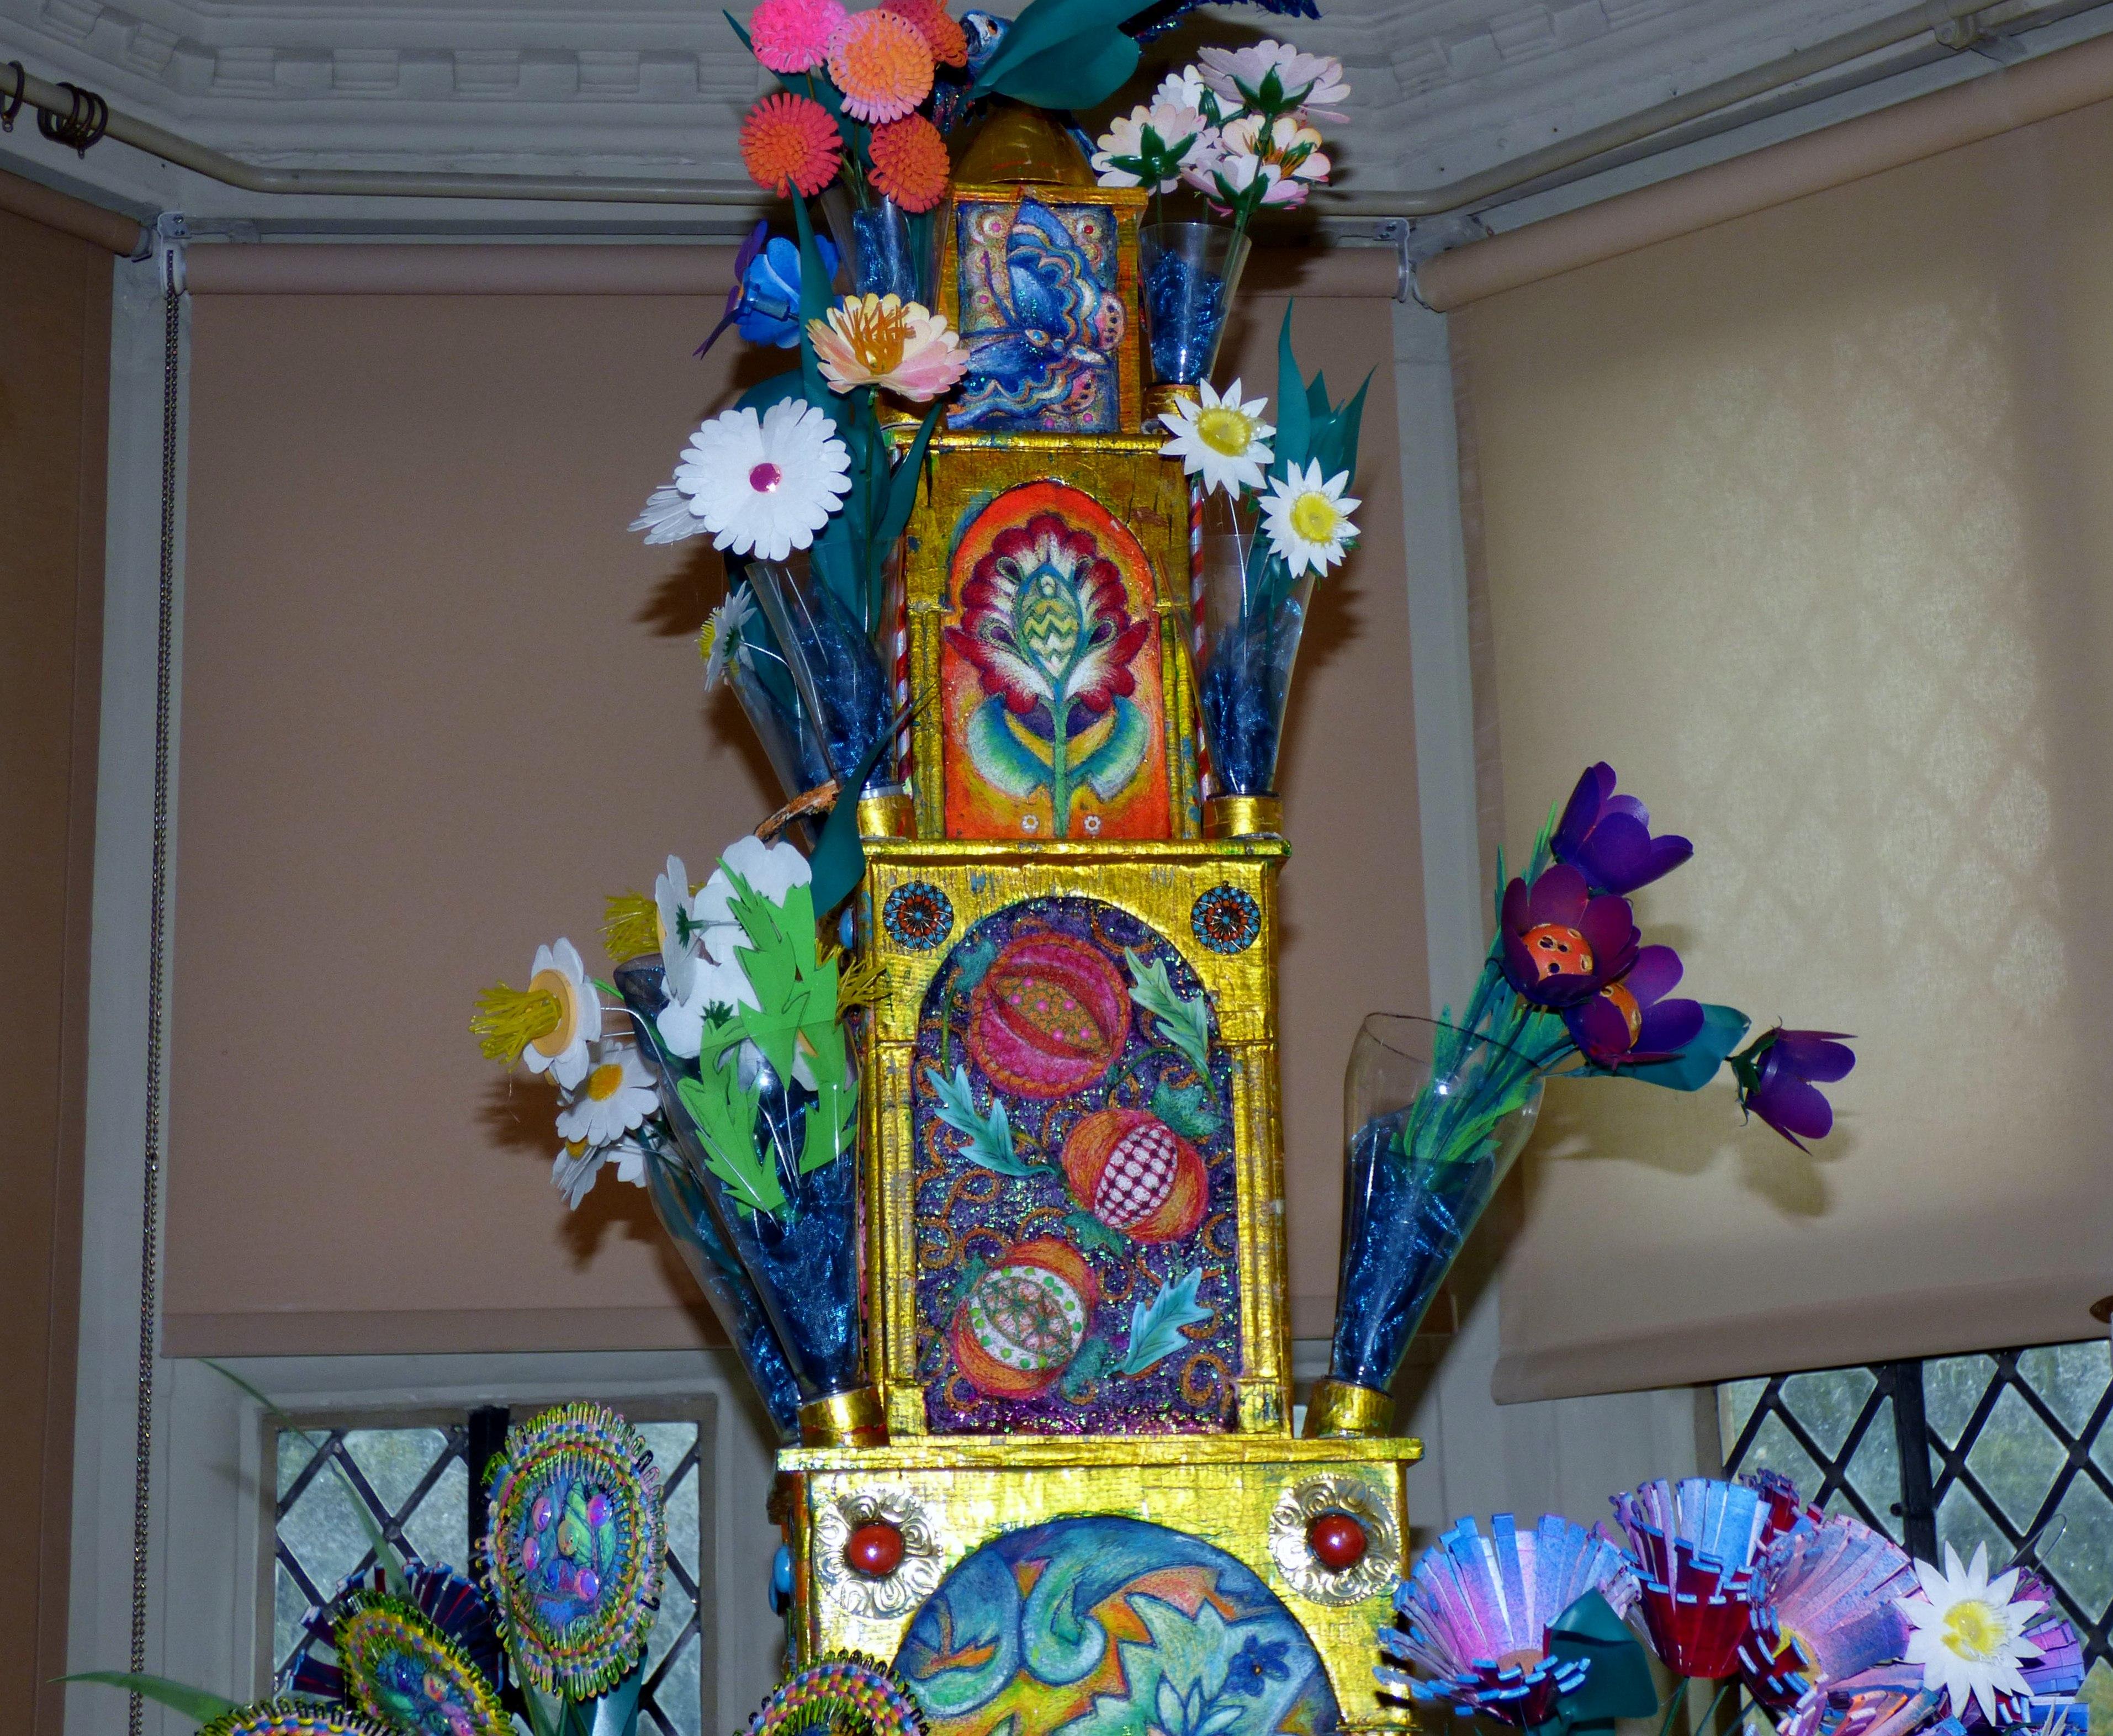 (detail) FLOWER POWER TOWER by Nikki Parmenter, Gawthorpe Hall, Sept 2020